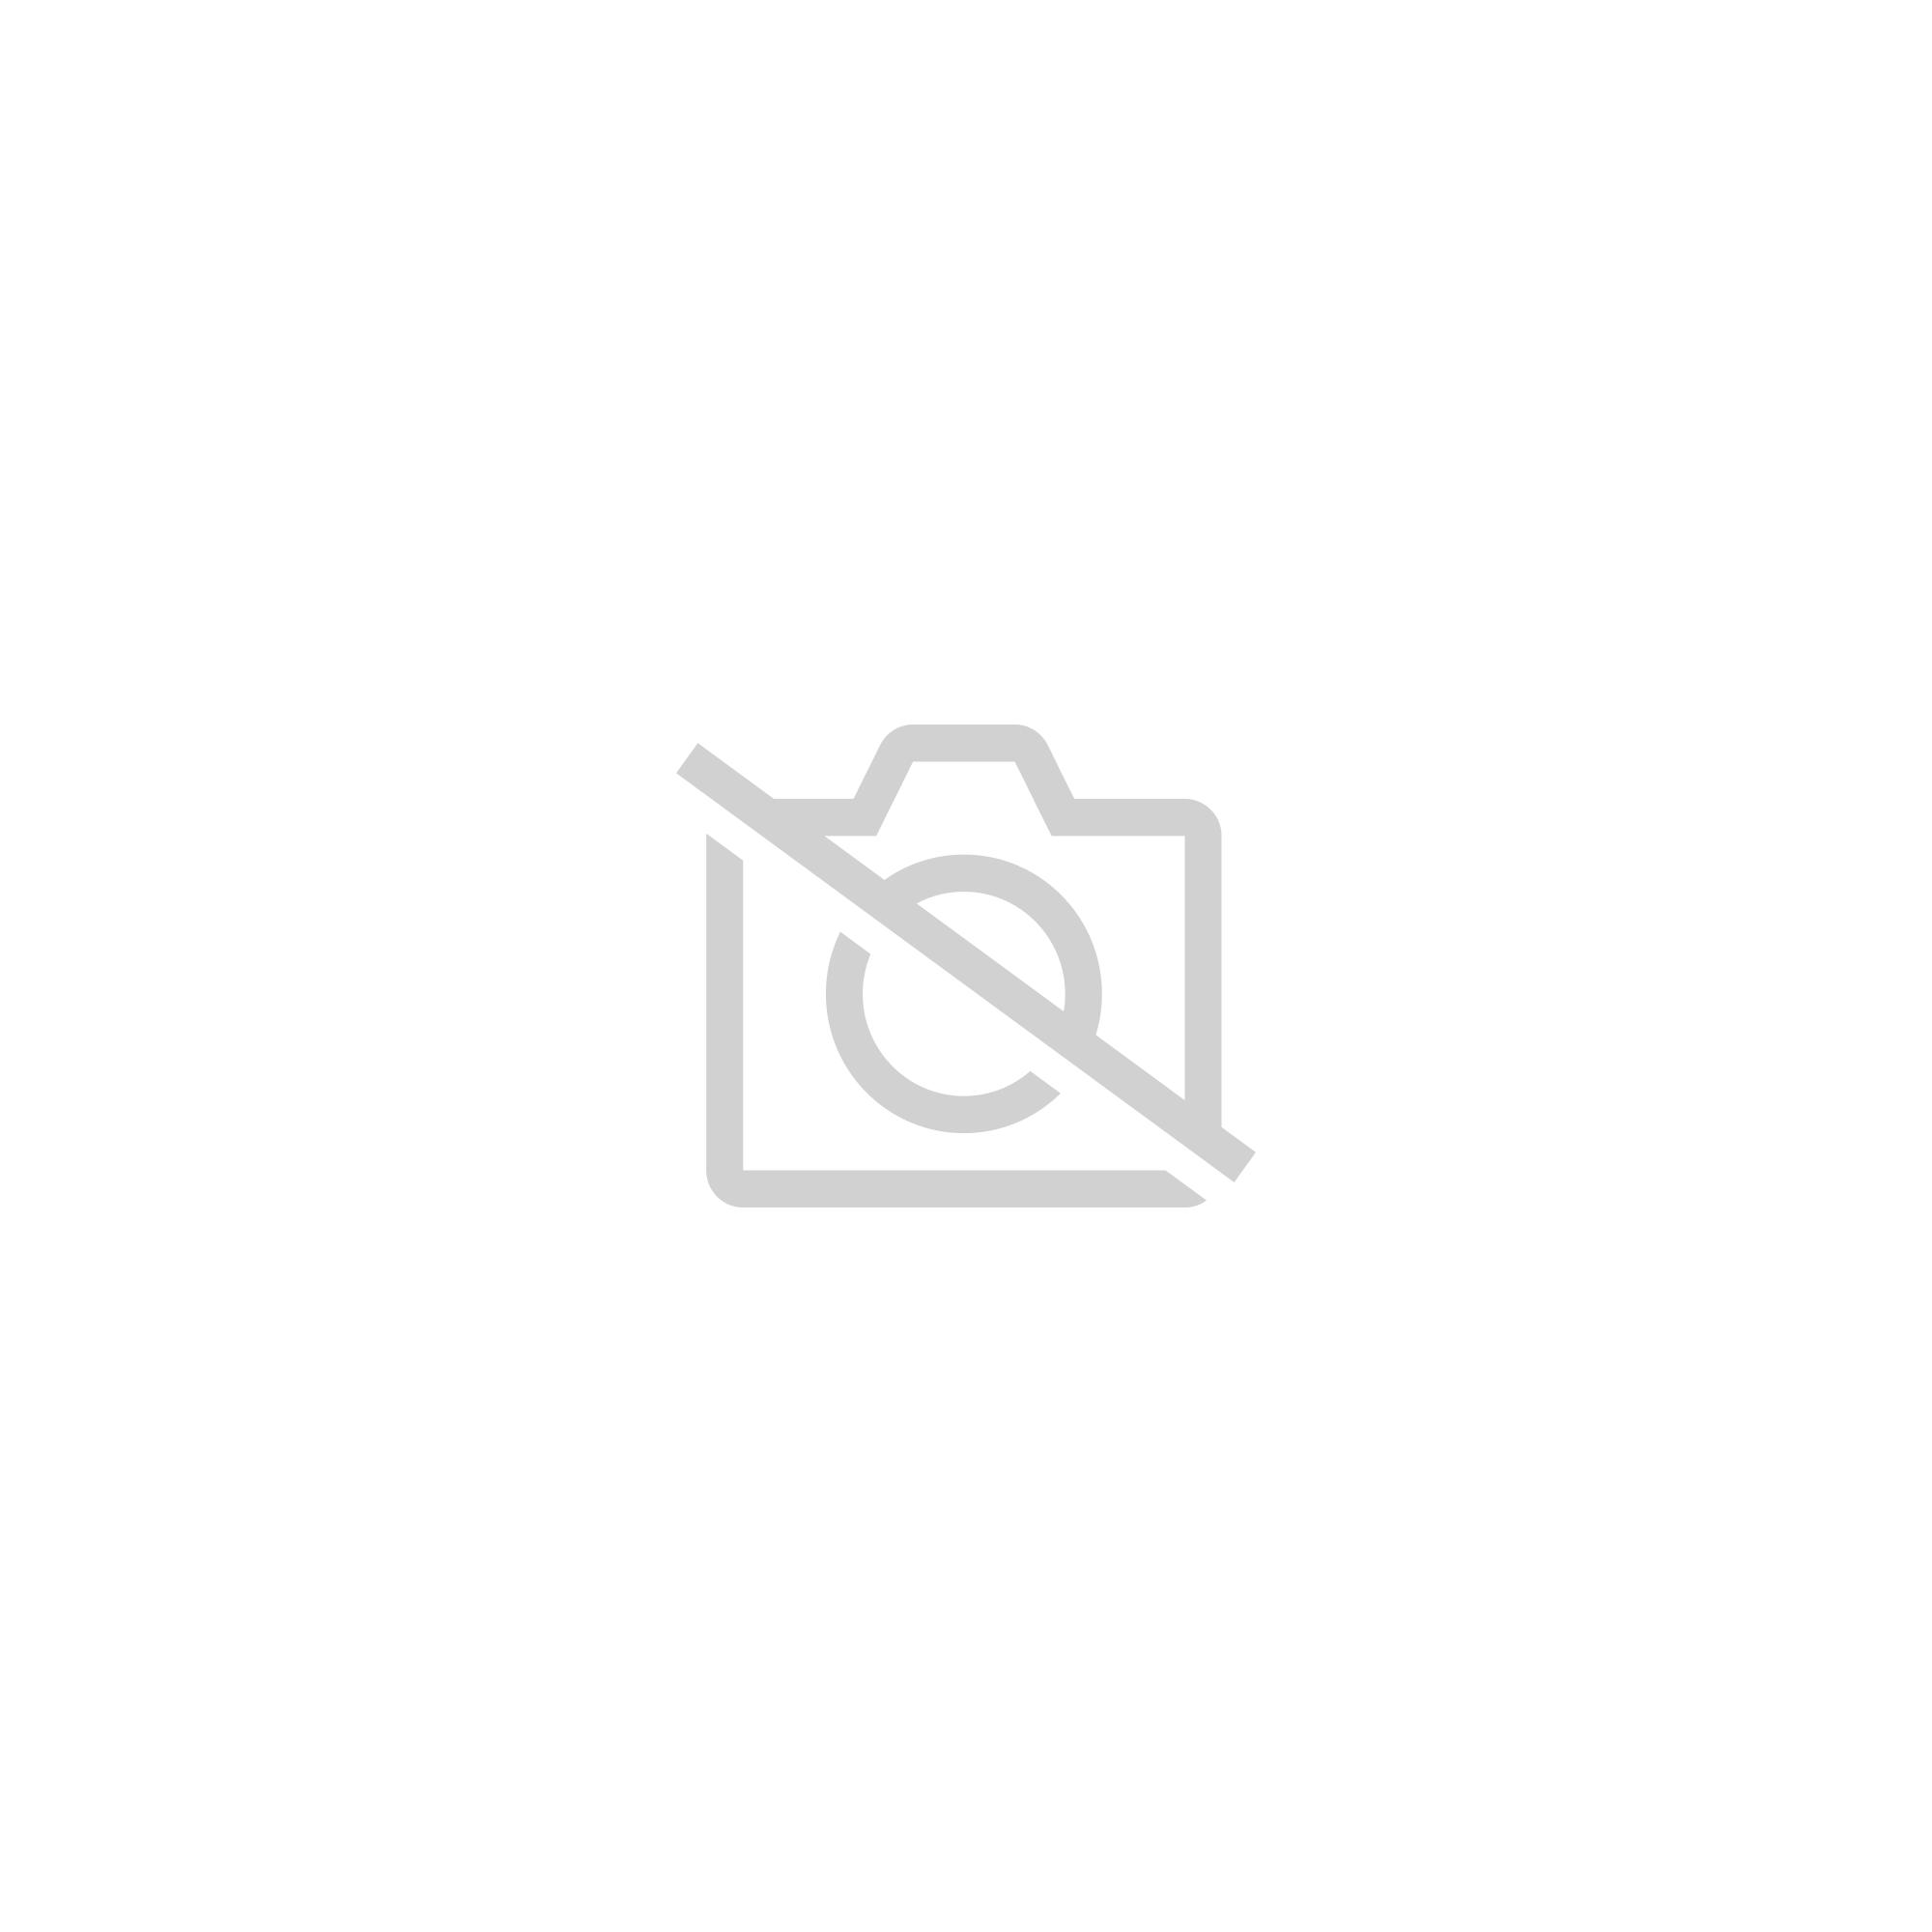 mini clavier rii 2013 sans fil souris touchpad combo. Black Bedroom Furniture Sets. Home Design Ideas